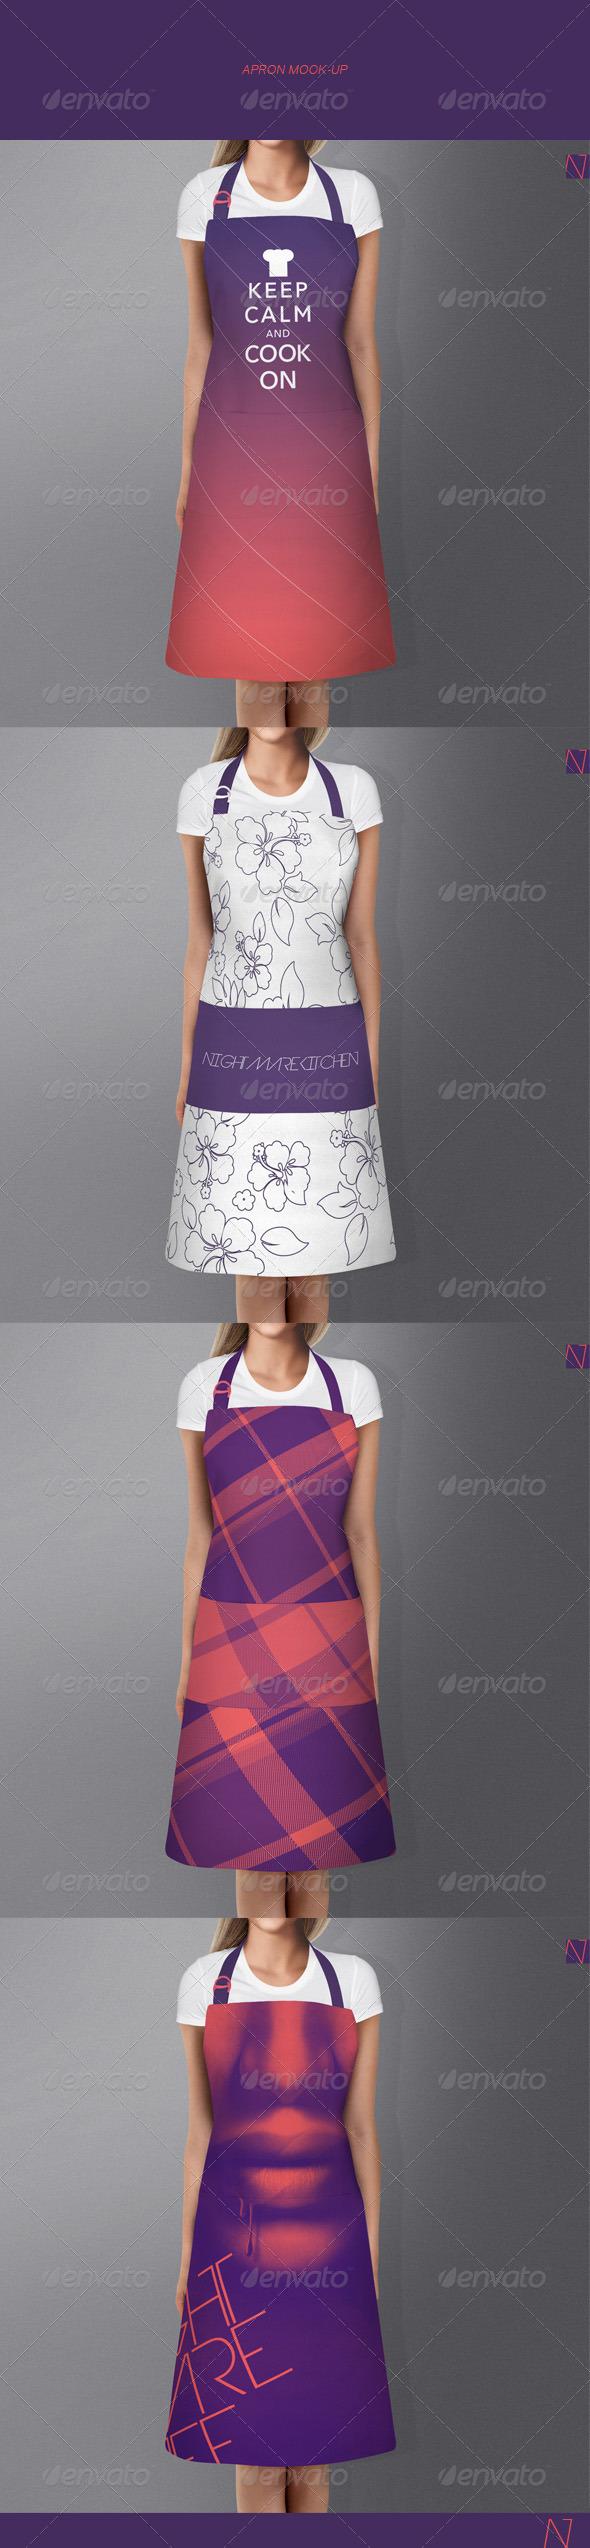 White apron mockup - Apron Mock Up Miscellaneous Apparel